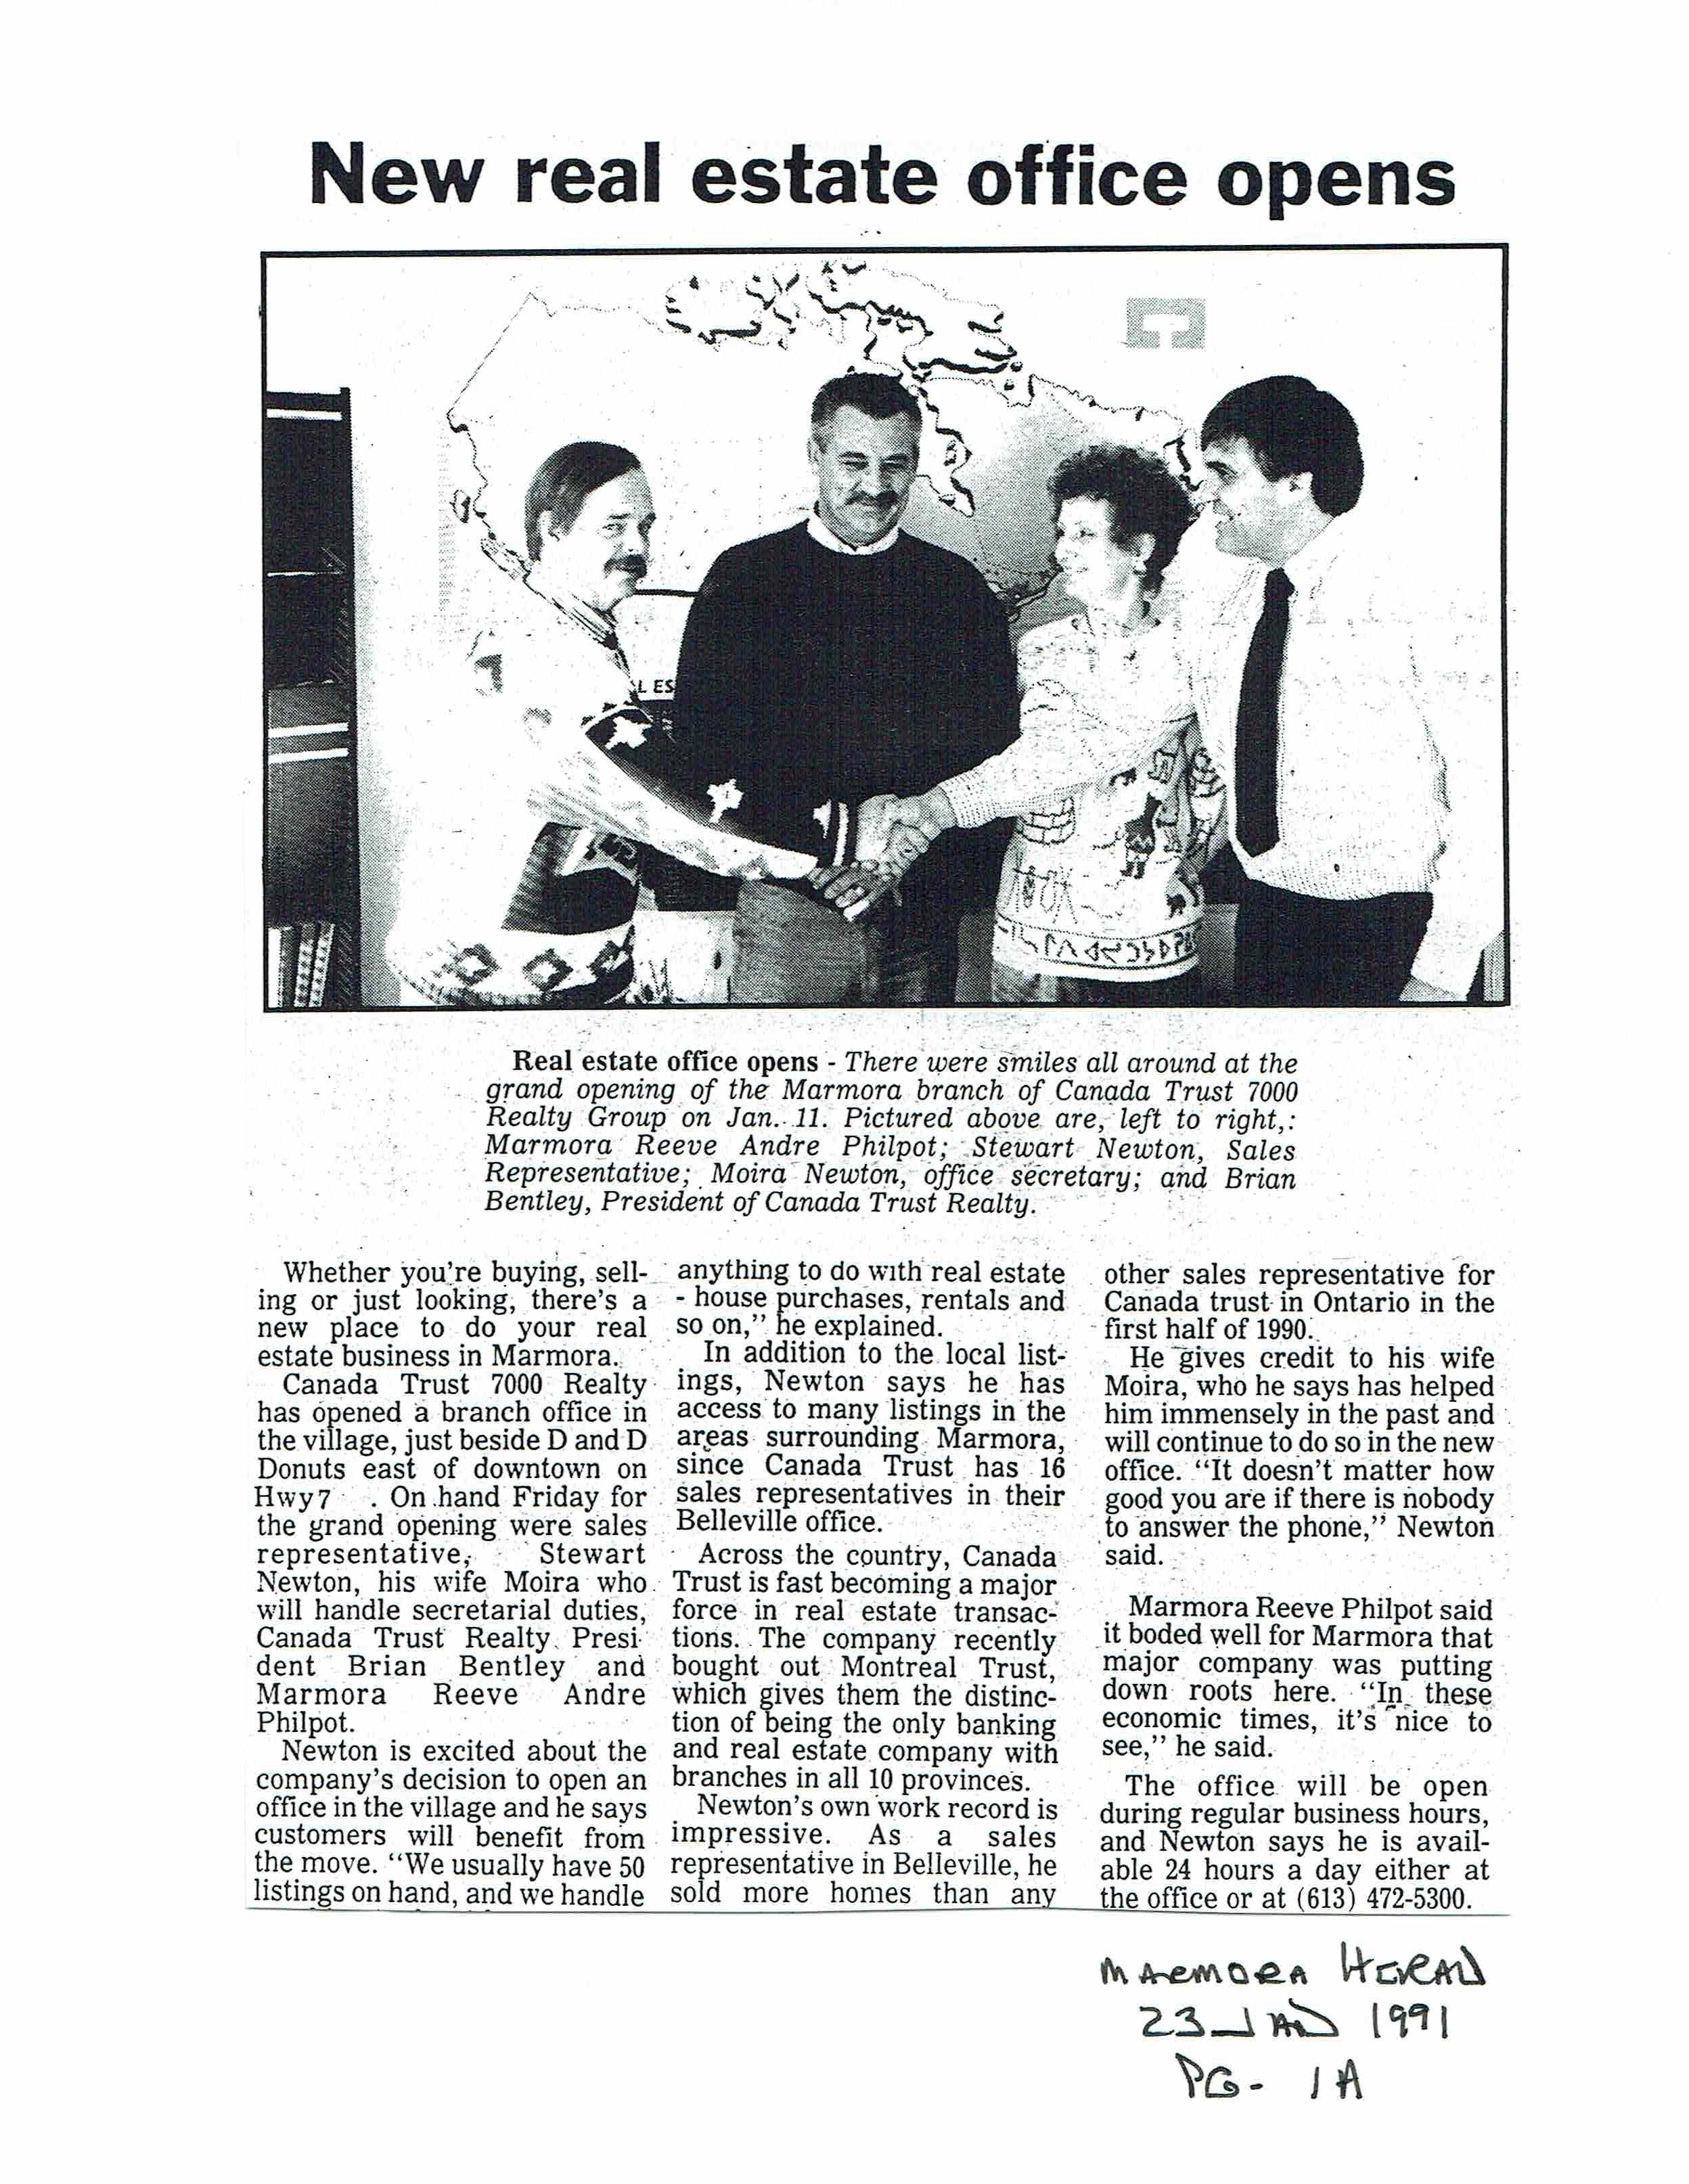 1991Stewart Newton Canada Trust 7000 real estate.JPG